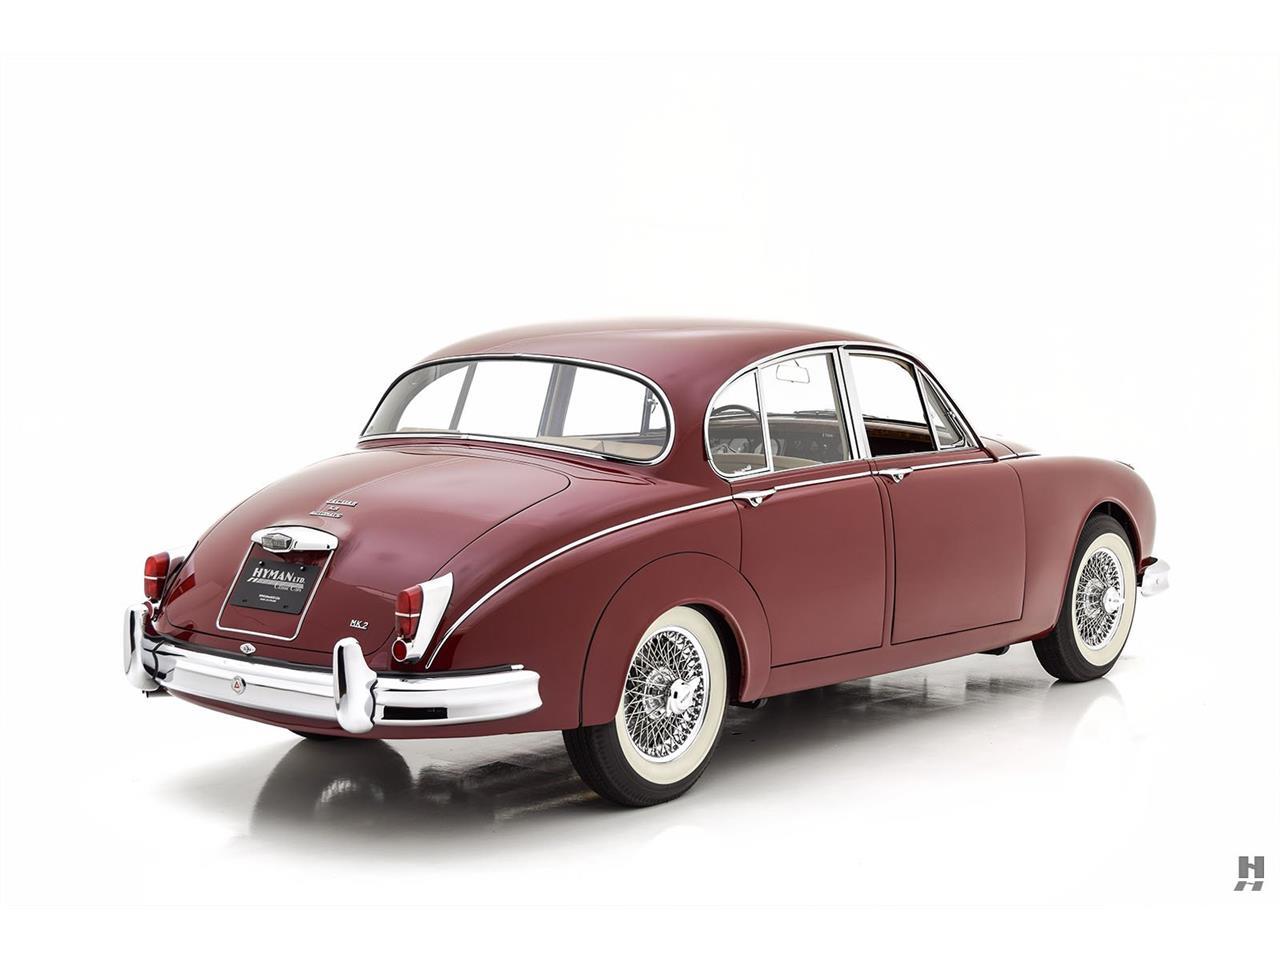 1962 Jaguar Mark II (CC-1210868) for sale in Saint Louis, Missouri